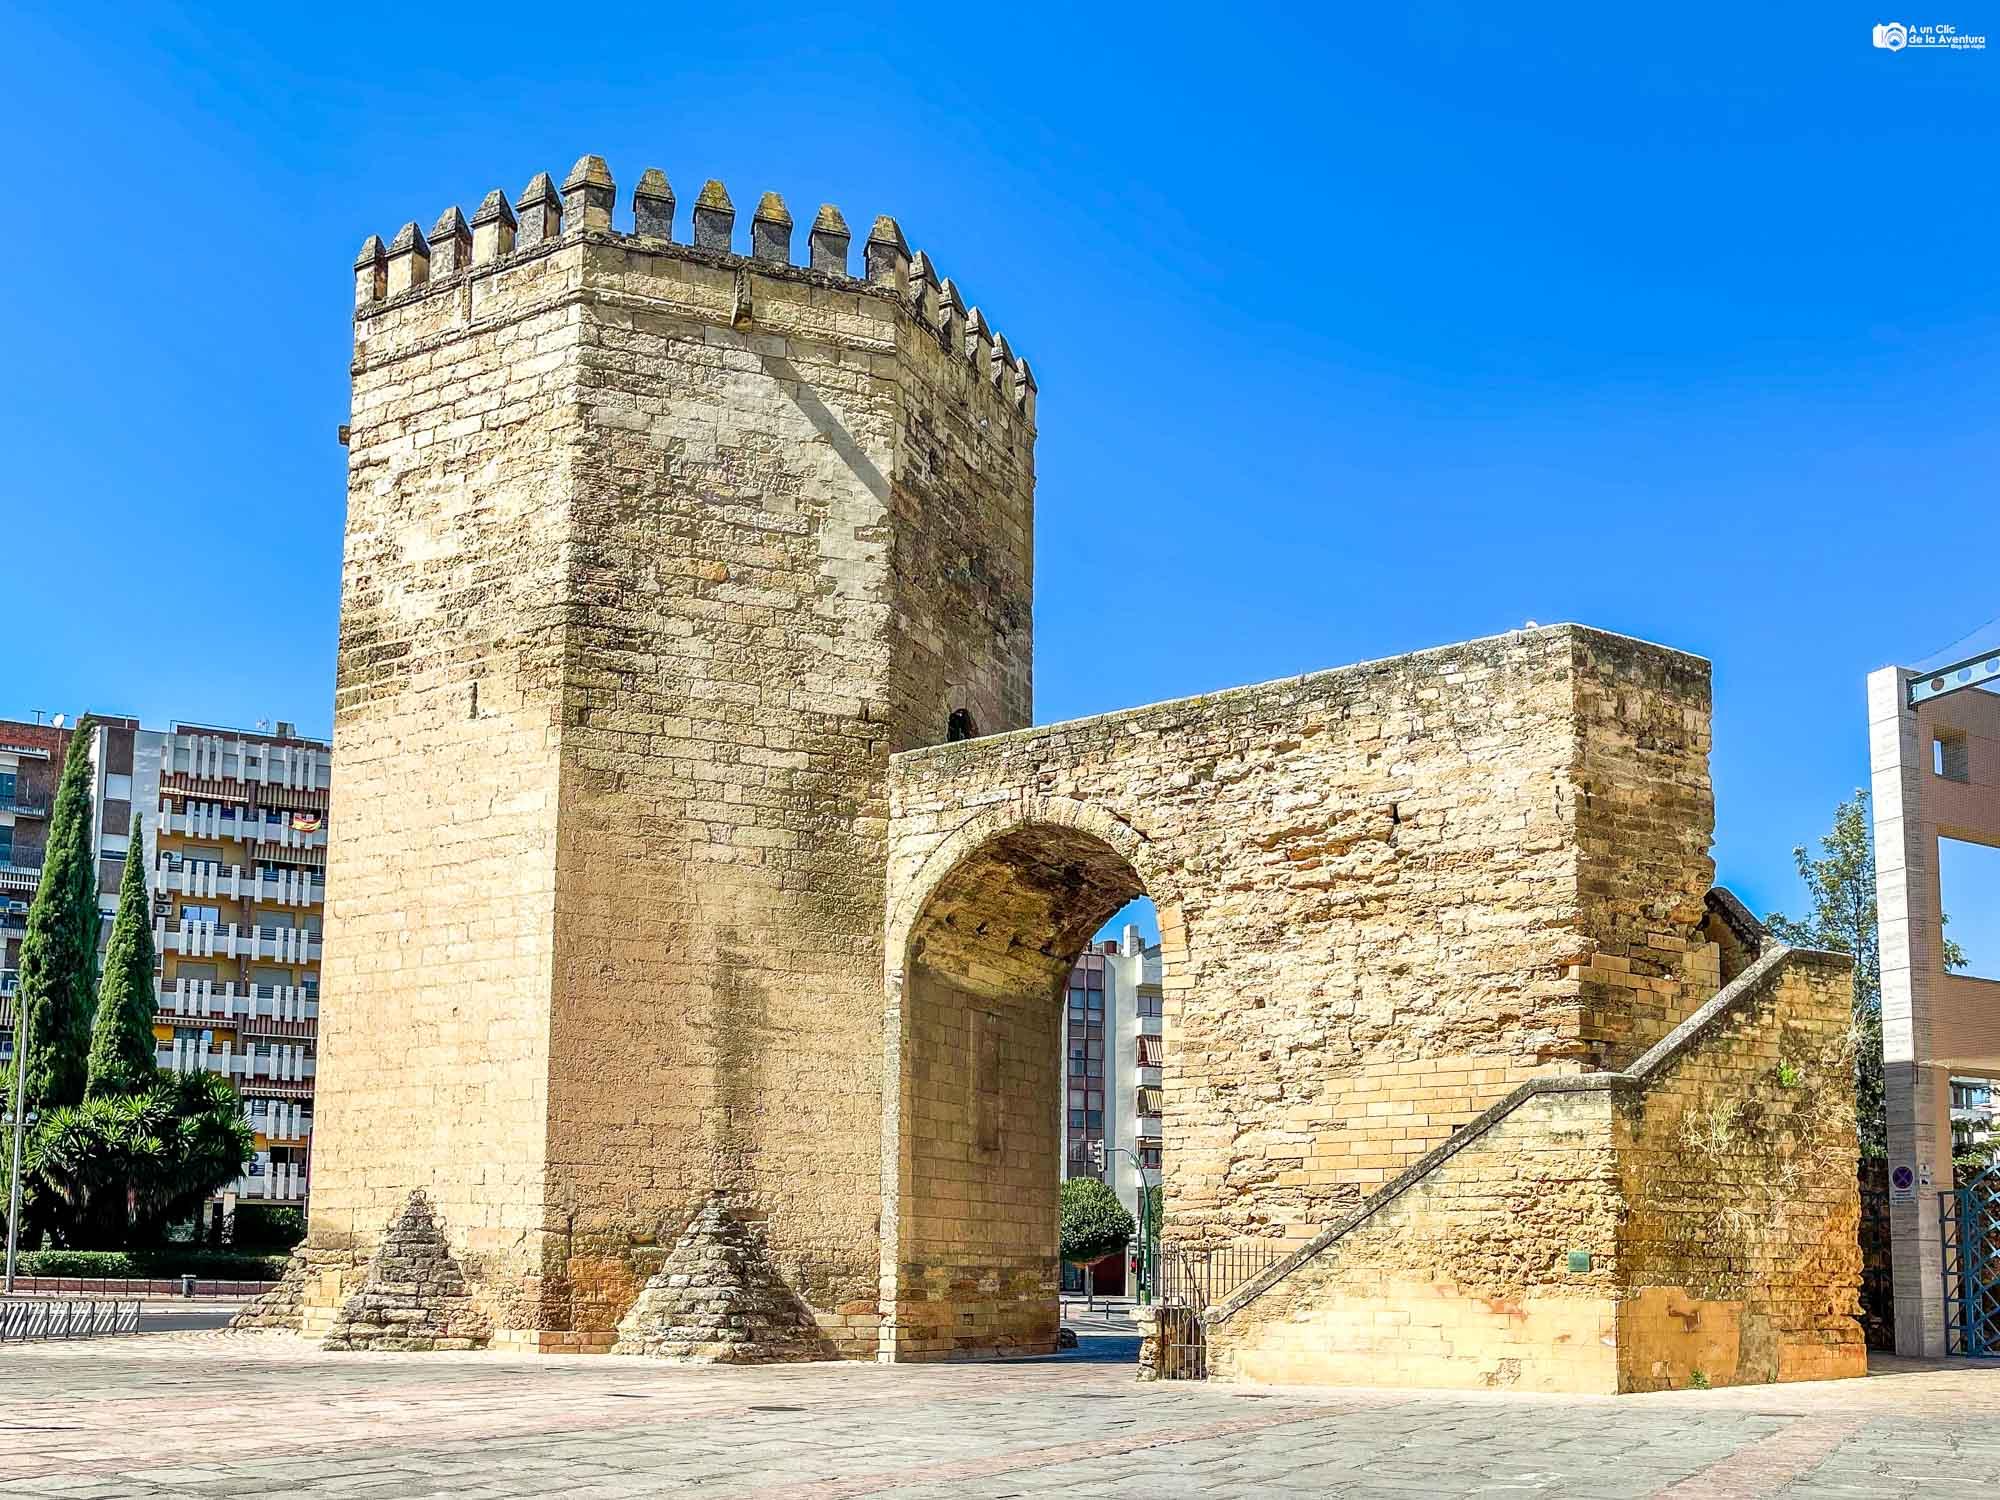 Torre de la Malmuerta, Córdoba